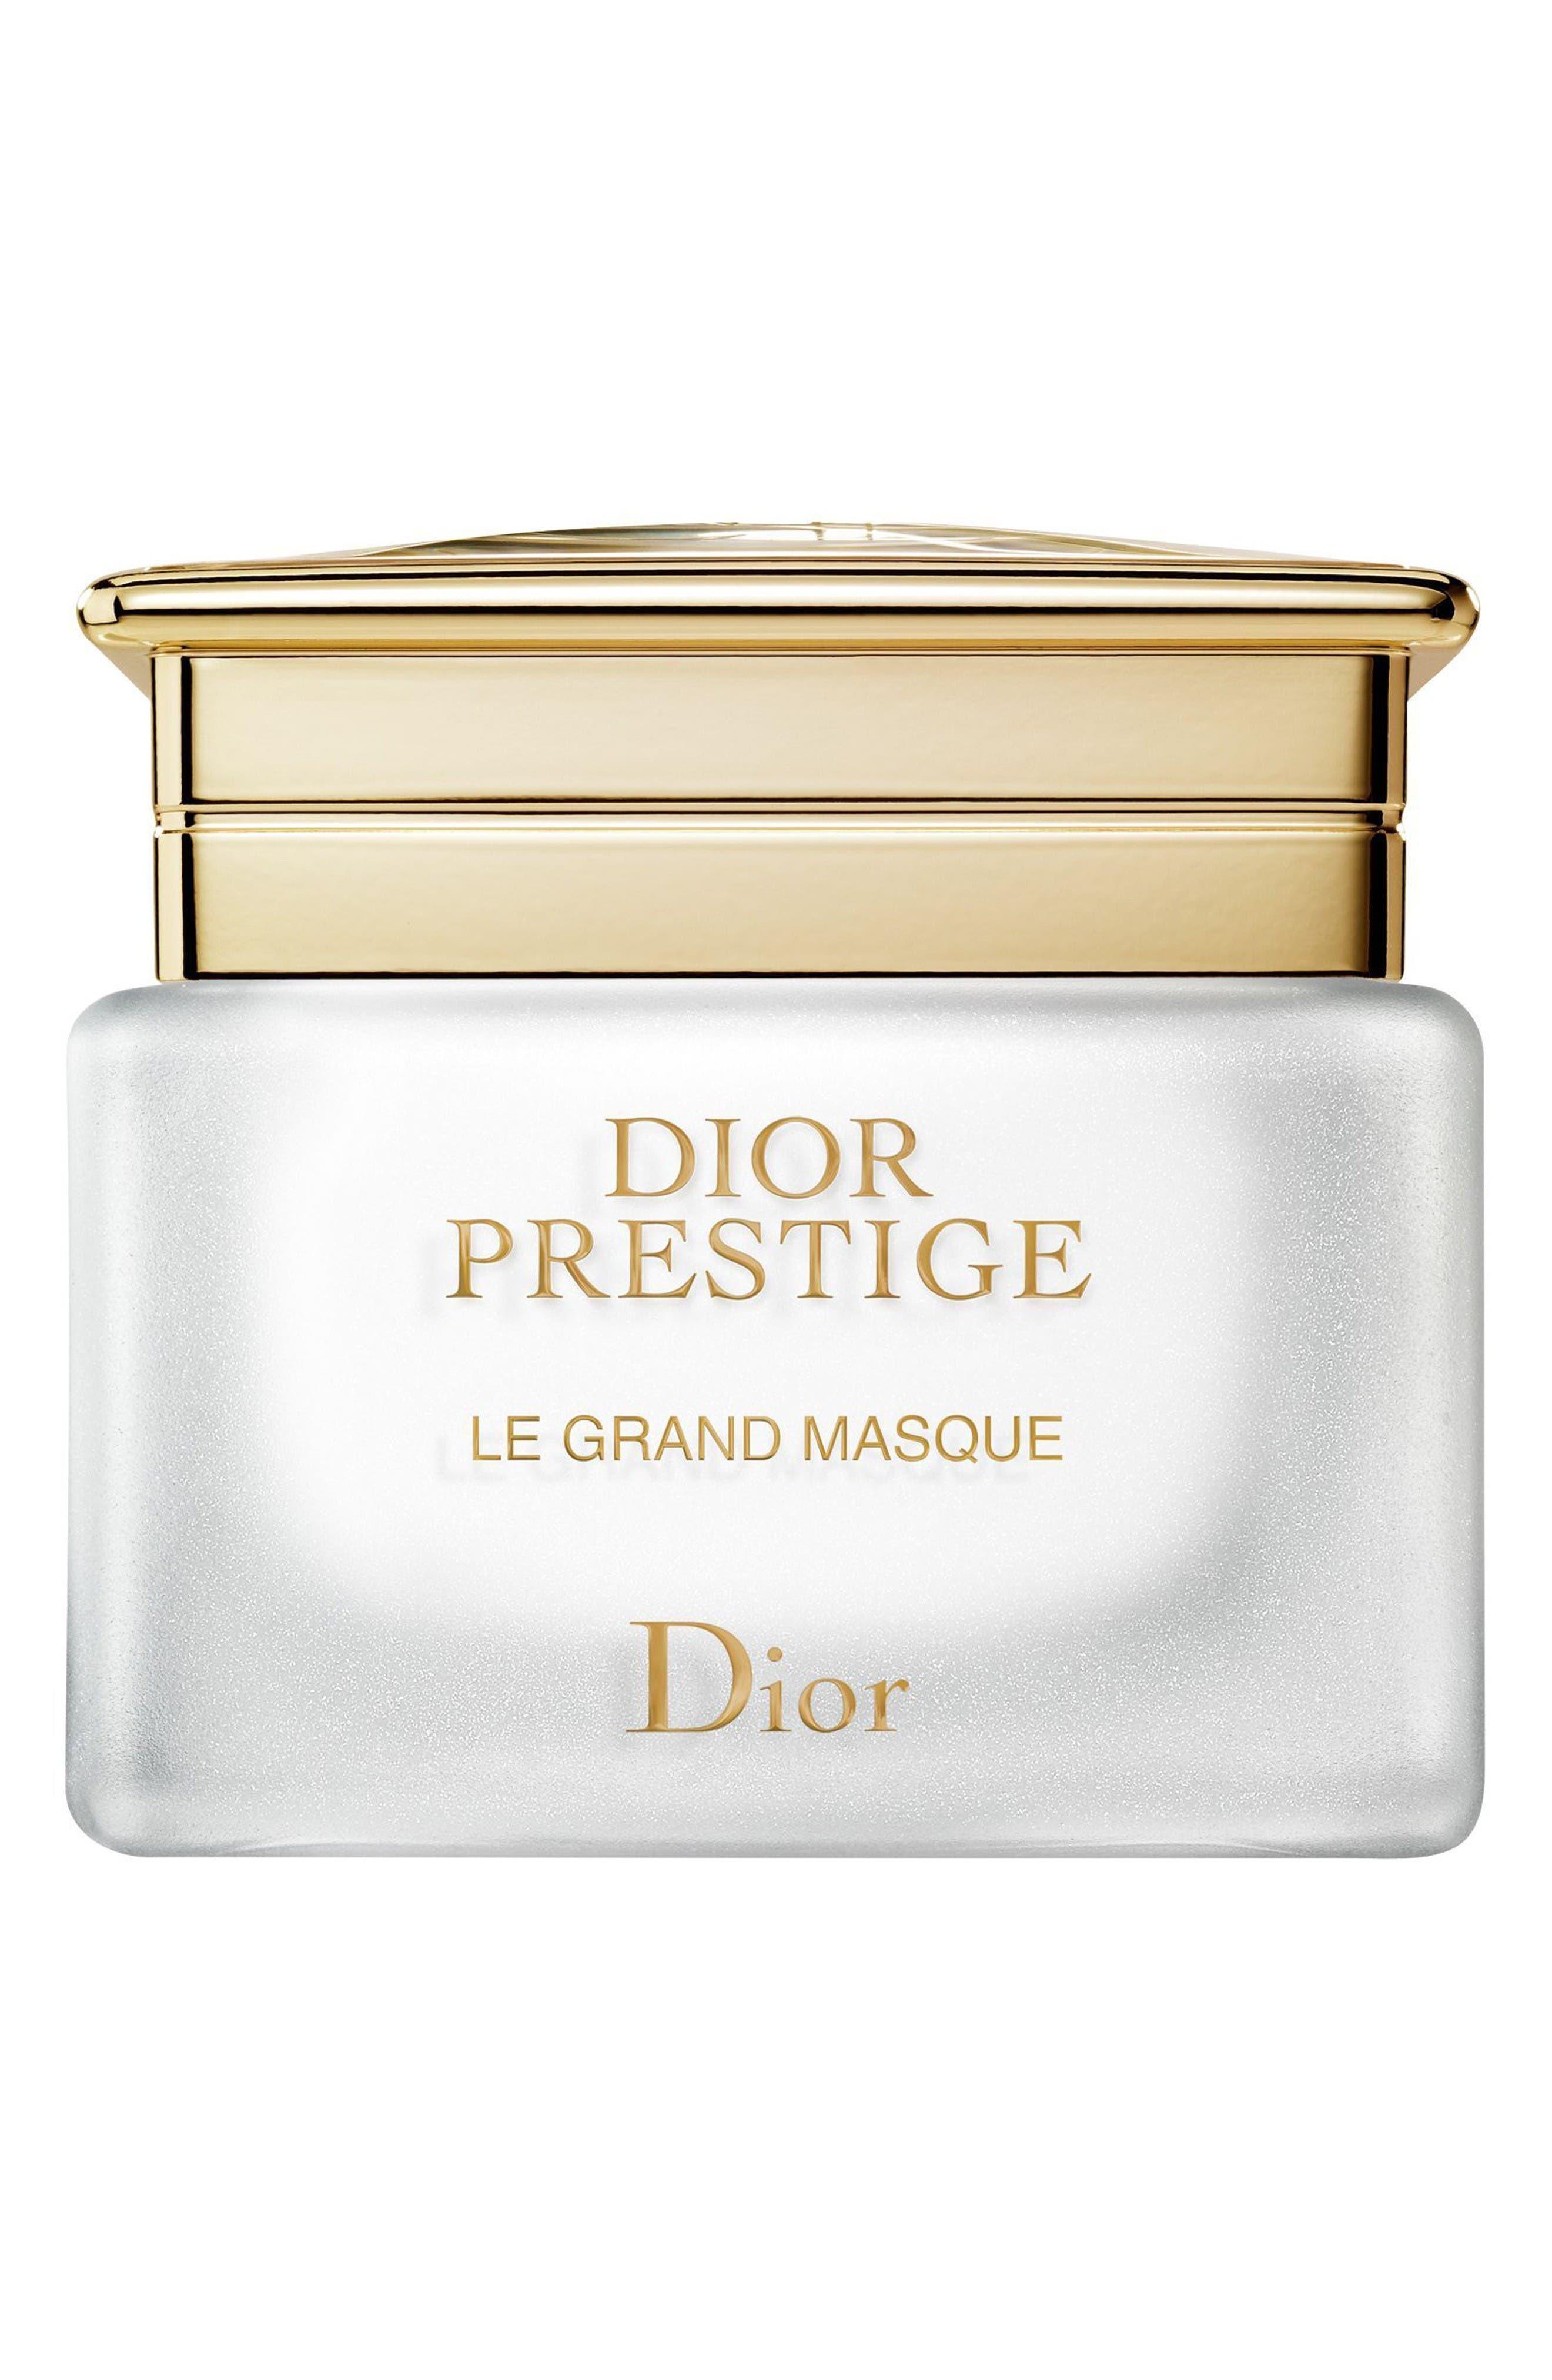 Prestige Le Grand Masque,                             Main thumbnail 1, color,                             No Color